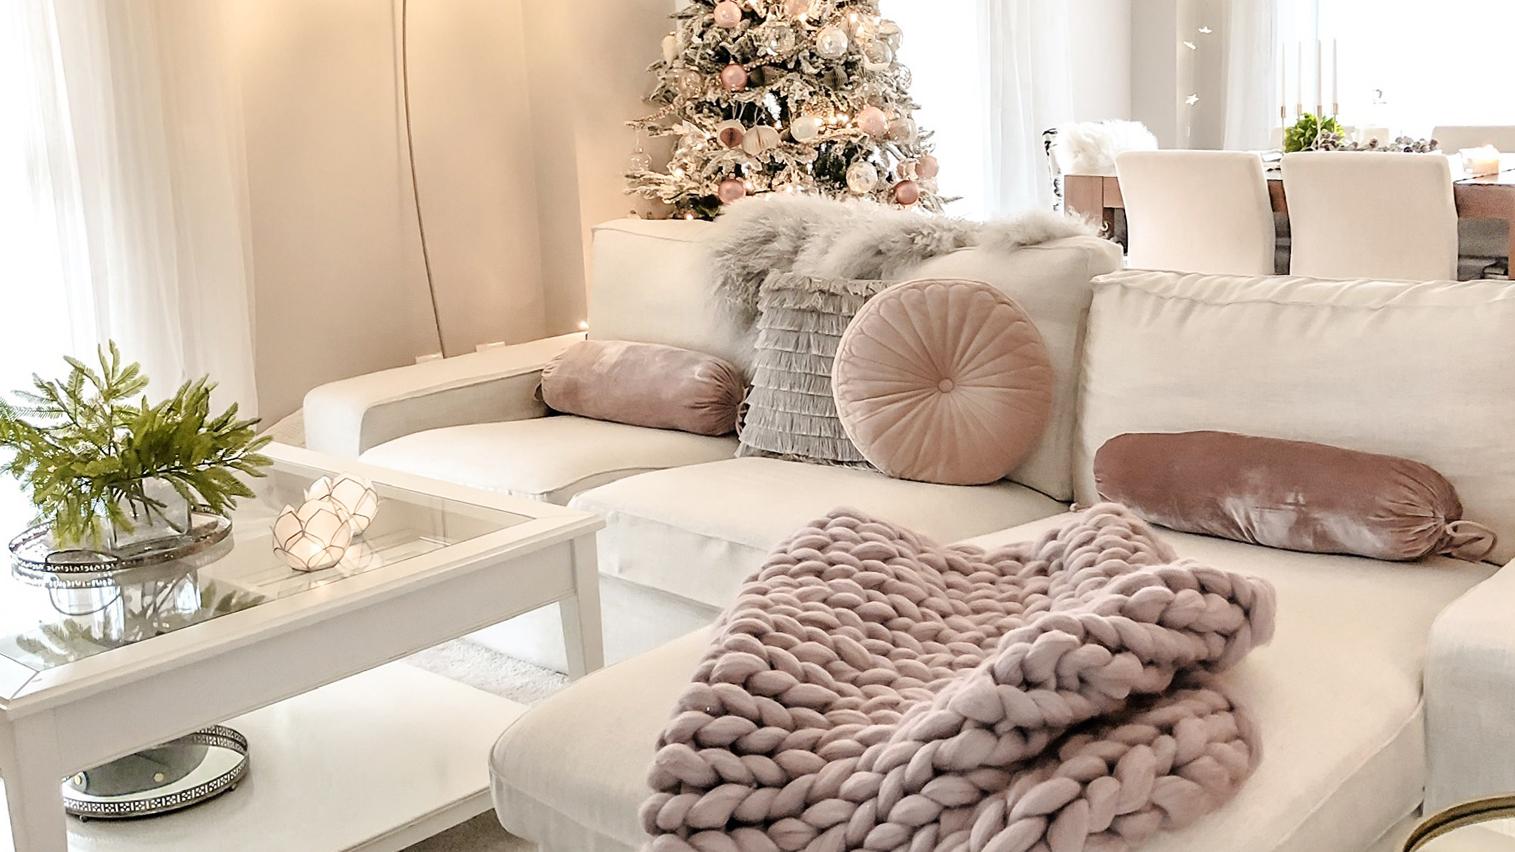 Tremendous Ikea Ekebol Review The Fancy Industrial Sofa Comfort Ibusinesslaw Wood Chair Design Ideas Ibusinesslaworg